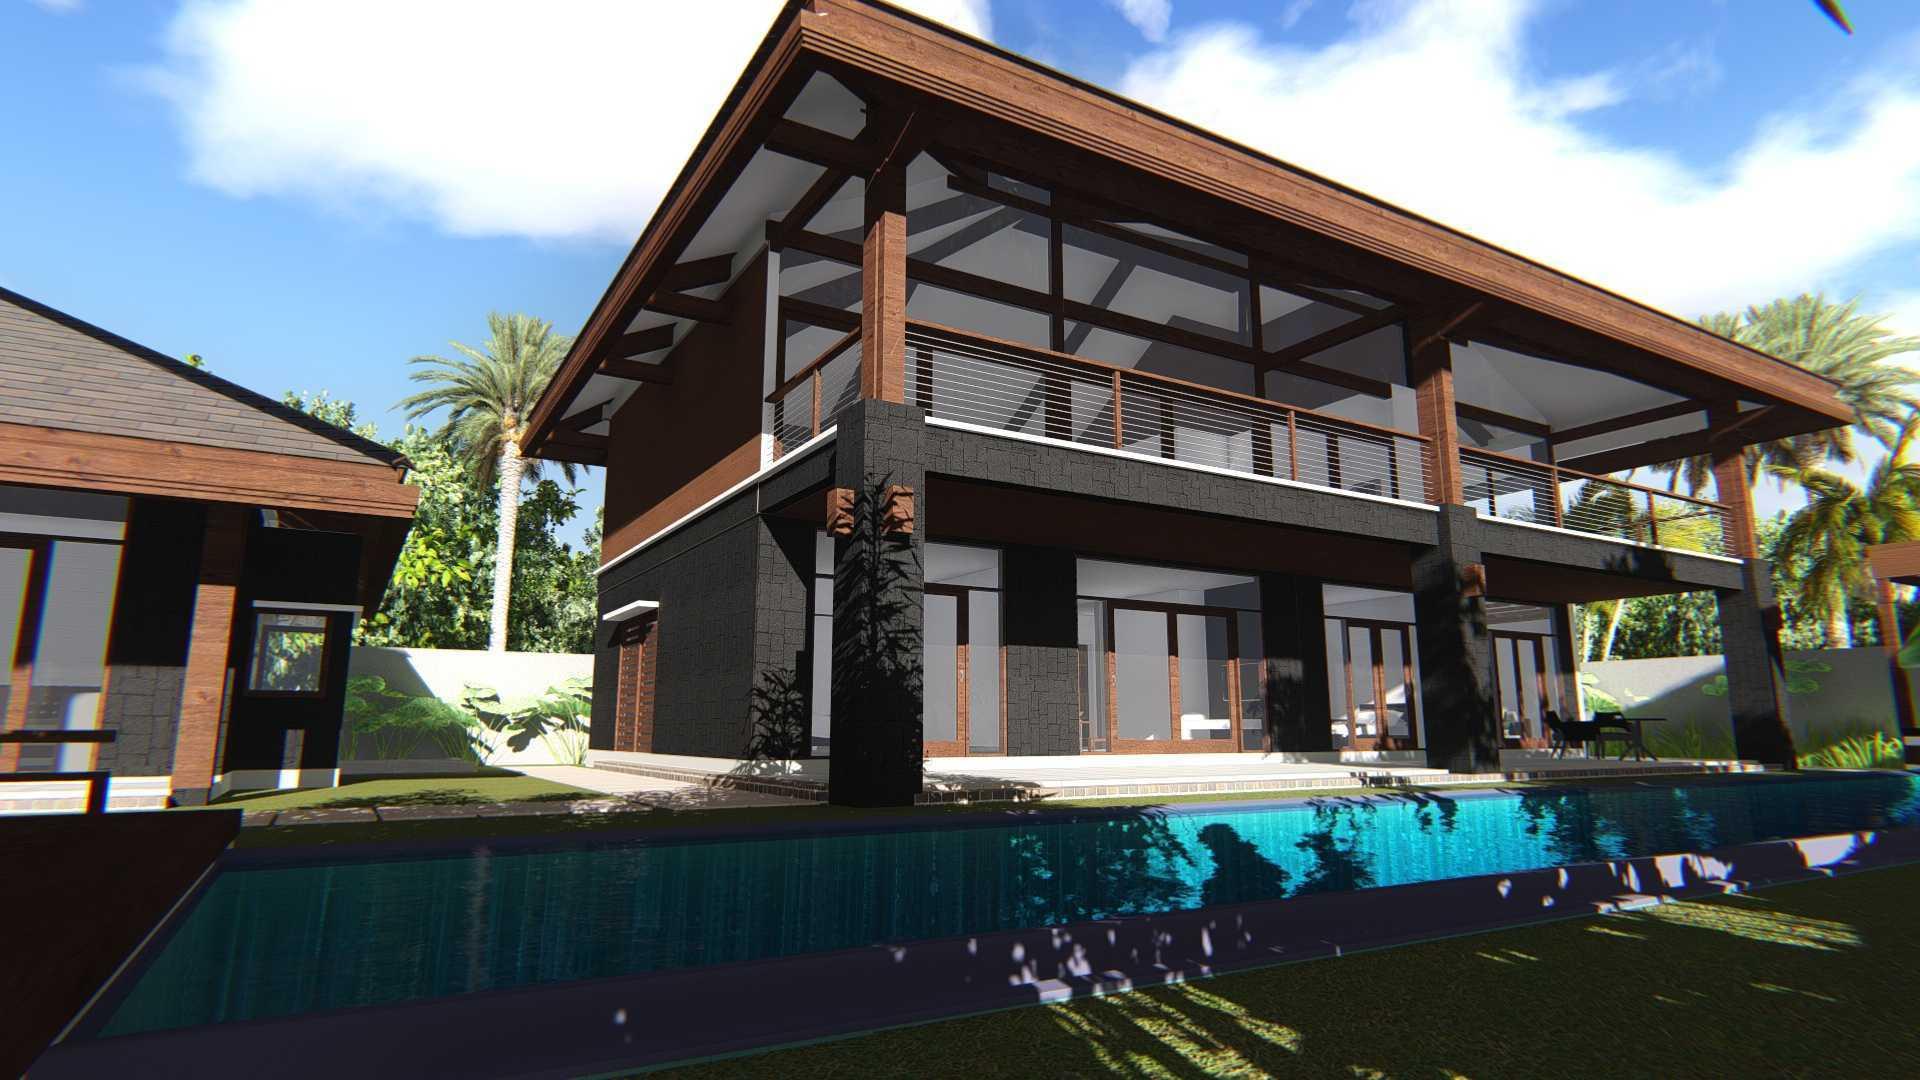 Archiola Villa Pecatu Pecatu, Kuta Sel., Kabupaten Badung, Bali, Indonesia Pecatu, Kuta Sel., Kabupaten Badung, Bali, Indonesia Villa Pecatu - Facade Asian  41760